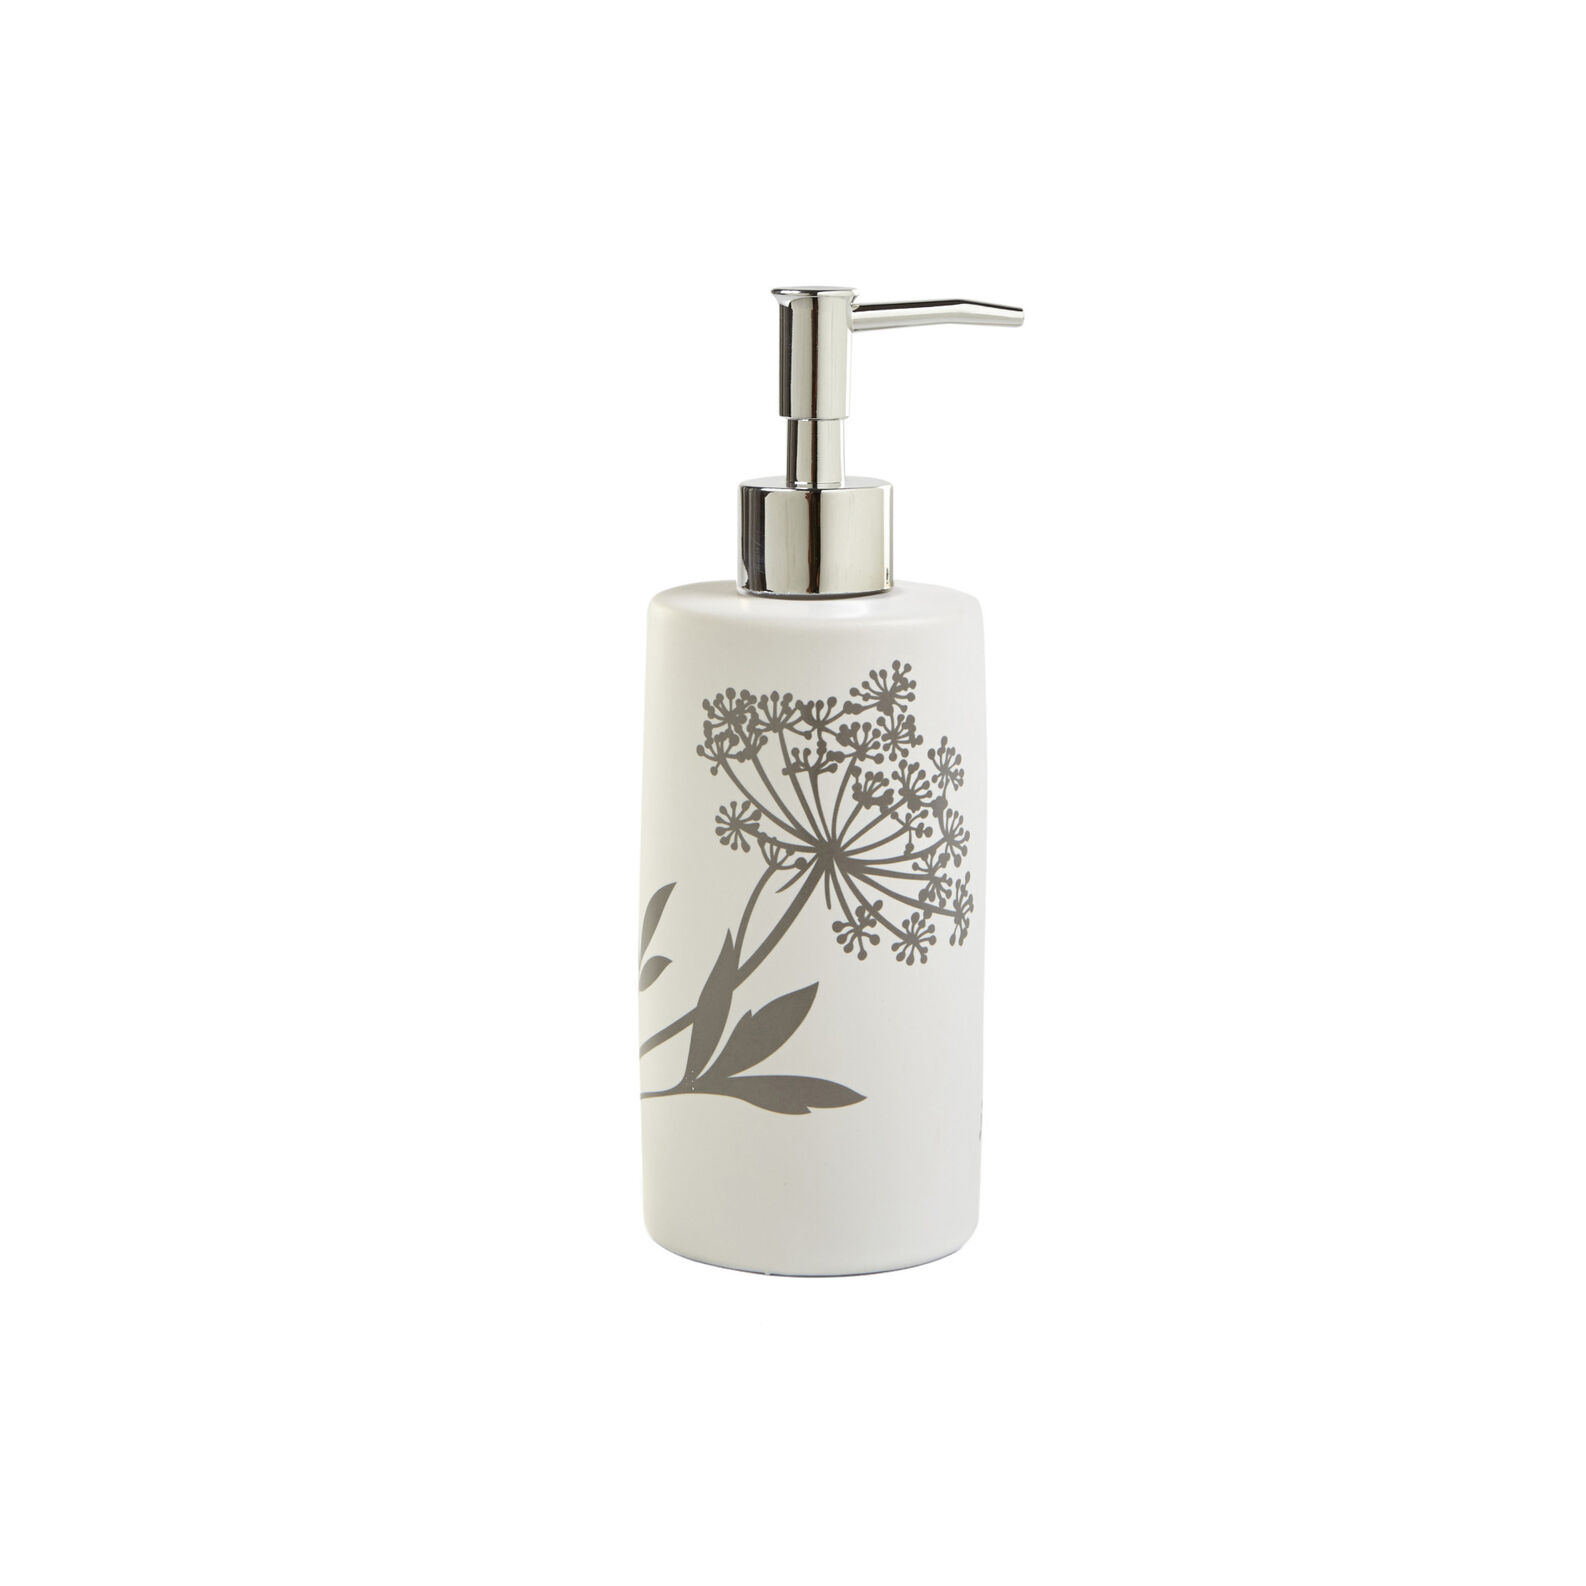 Dispenser ceramica floreale